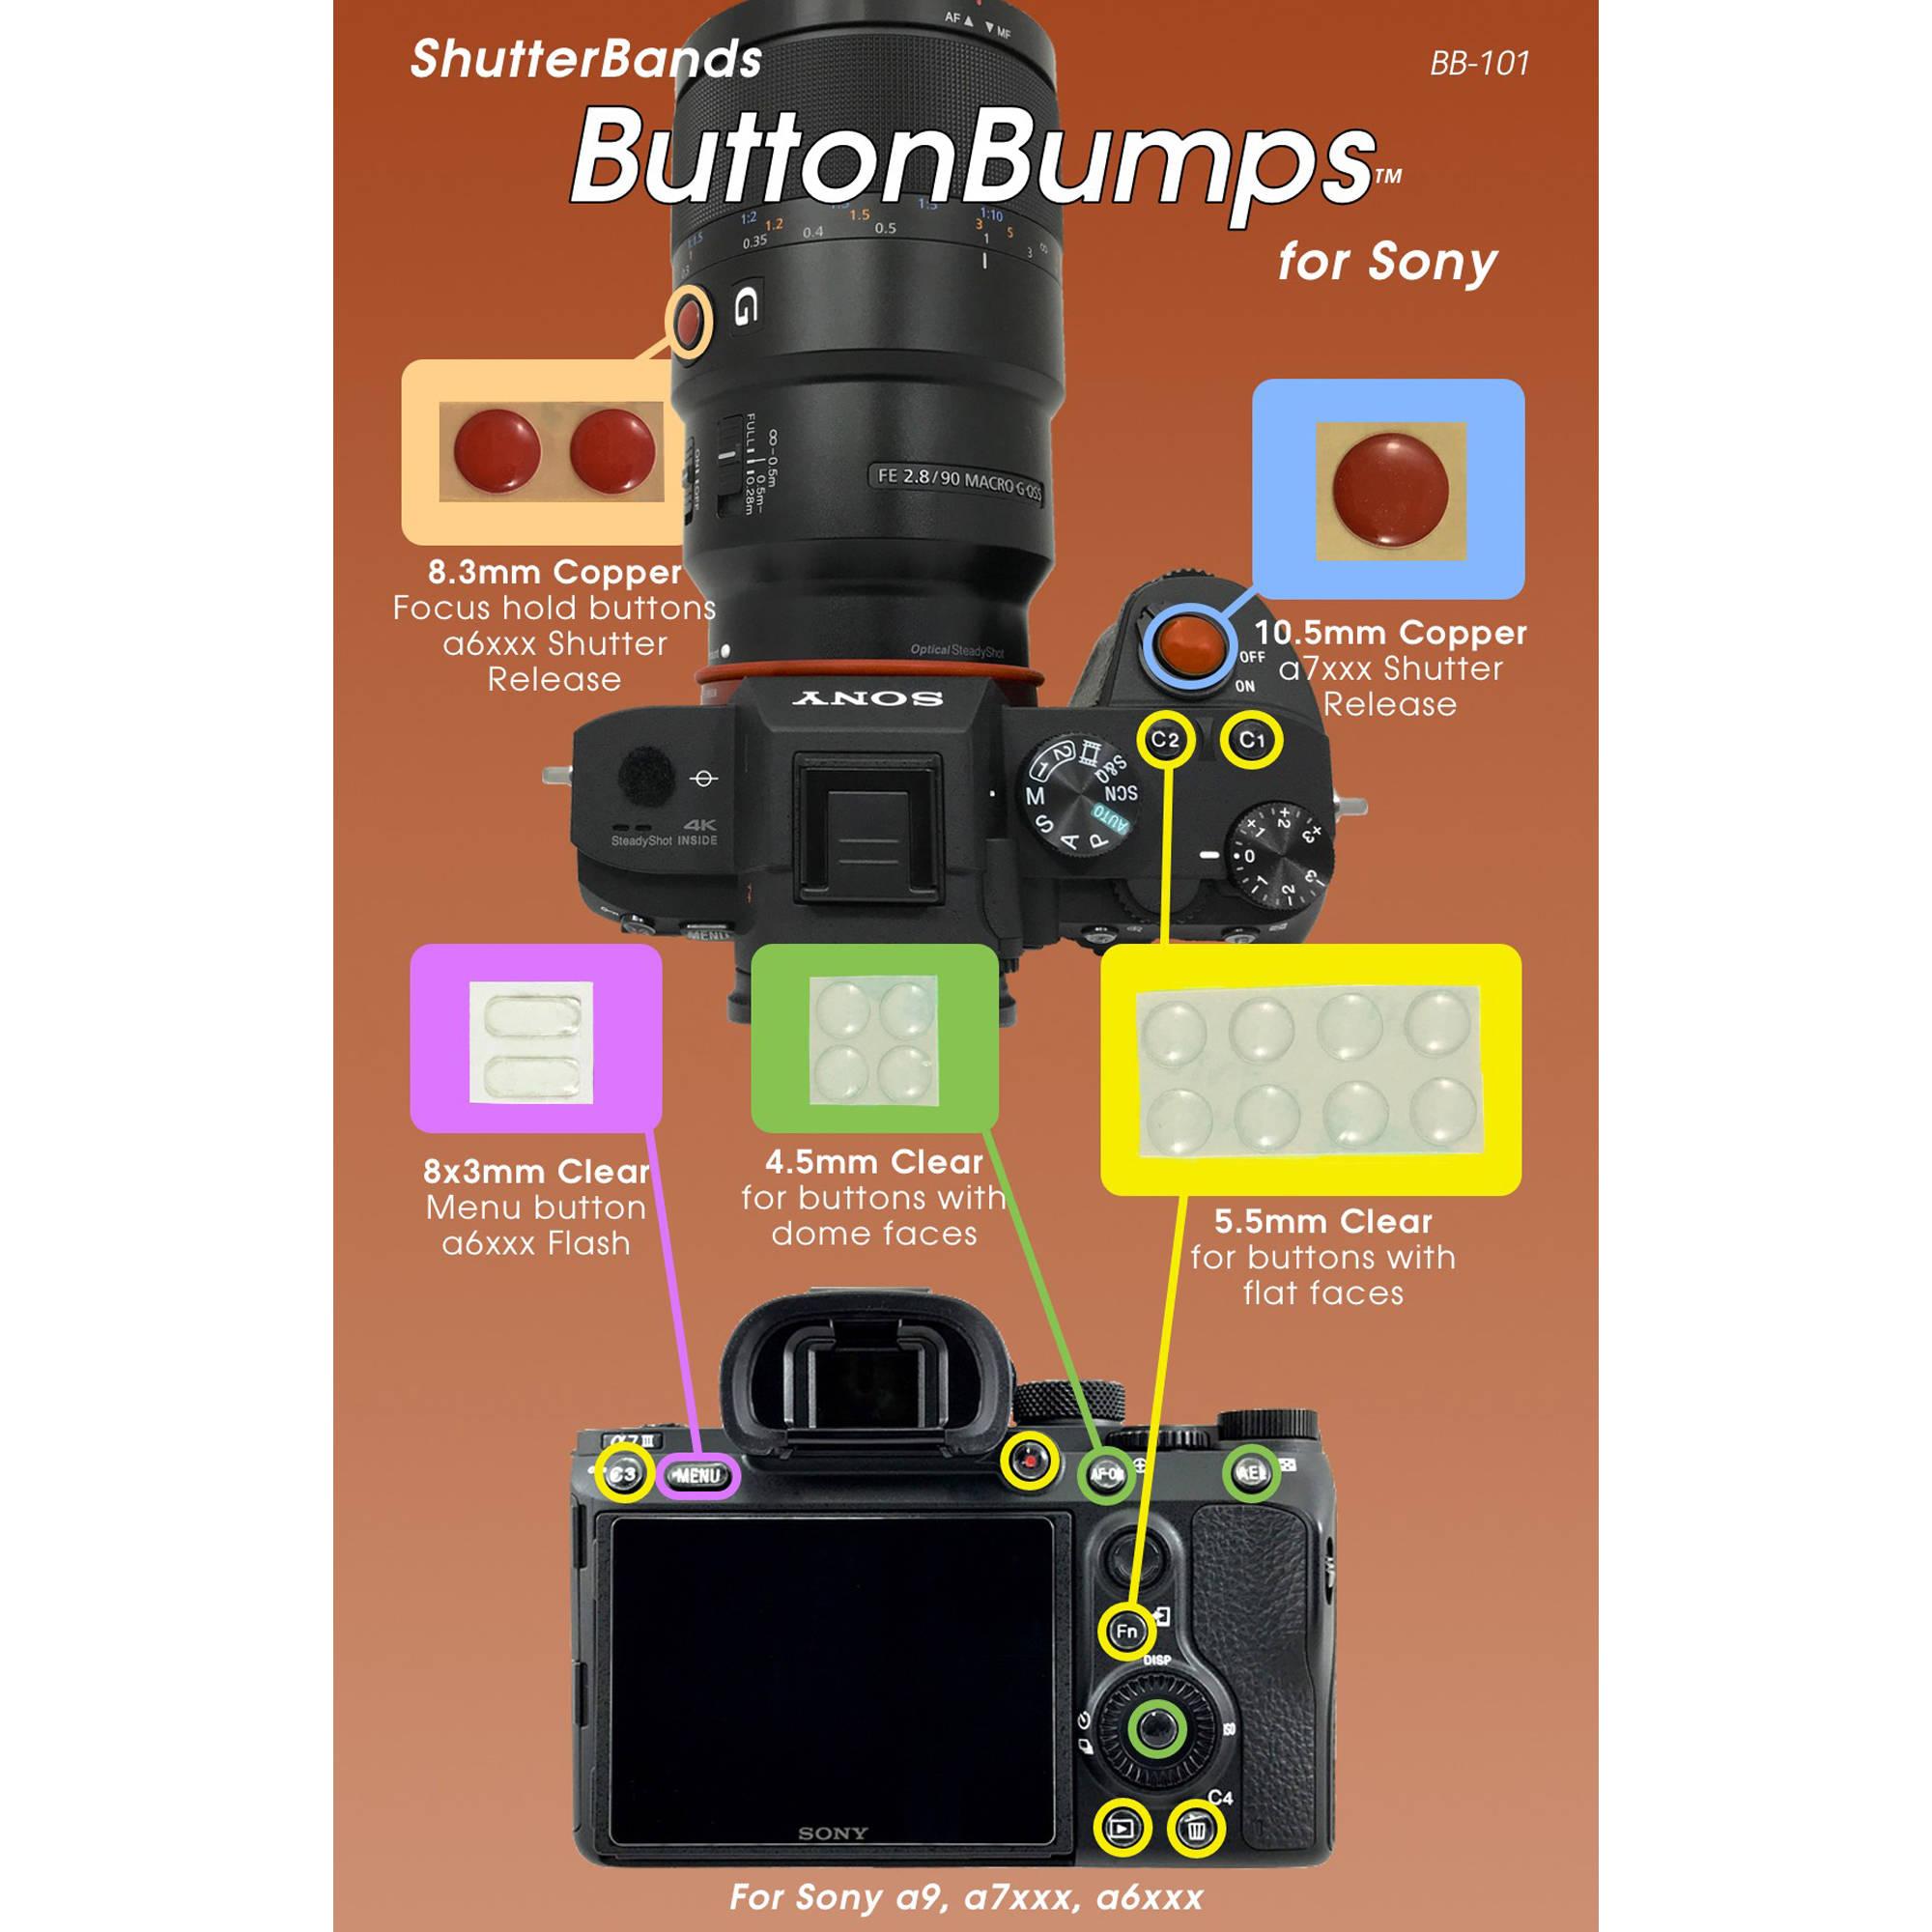 84 Pocket Album Storage Book For Fujifilm Polaroid Fuji Instax Mini 50s 7 8s Ej